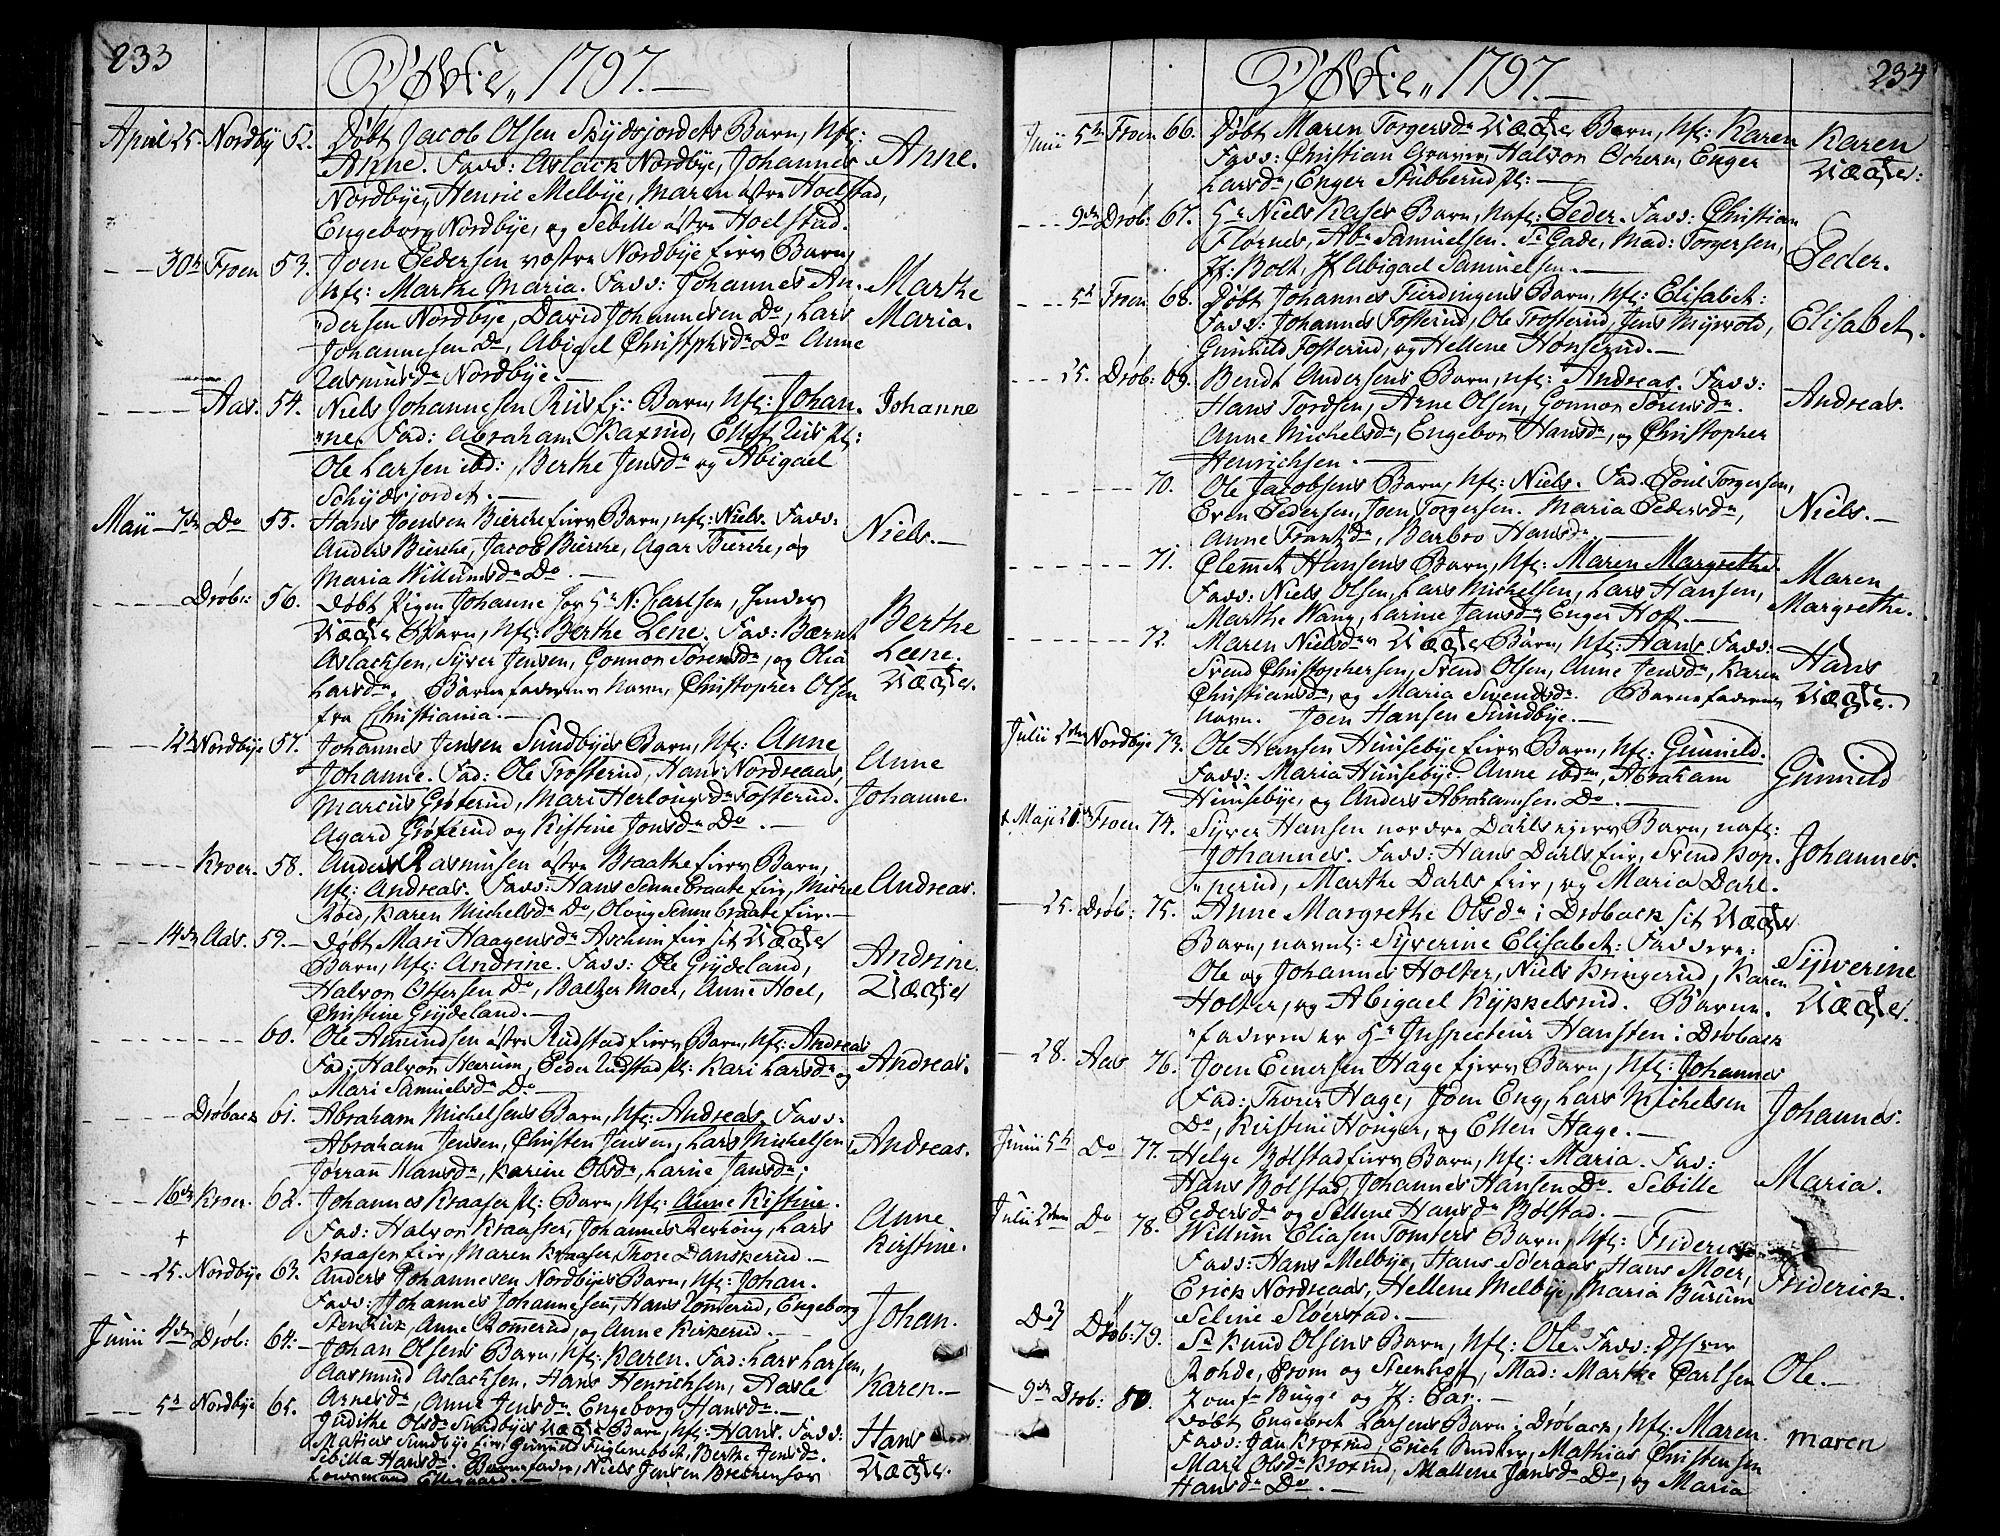 SAO, Ås prestekontor Kirkebøker, F/Fa/L0002: Ministerialbok nr. I 2, 1778-1813, s. 233-234